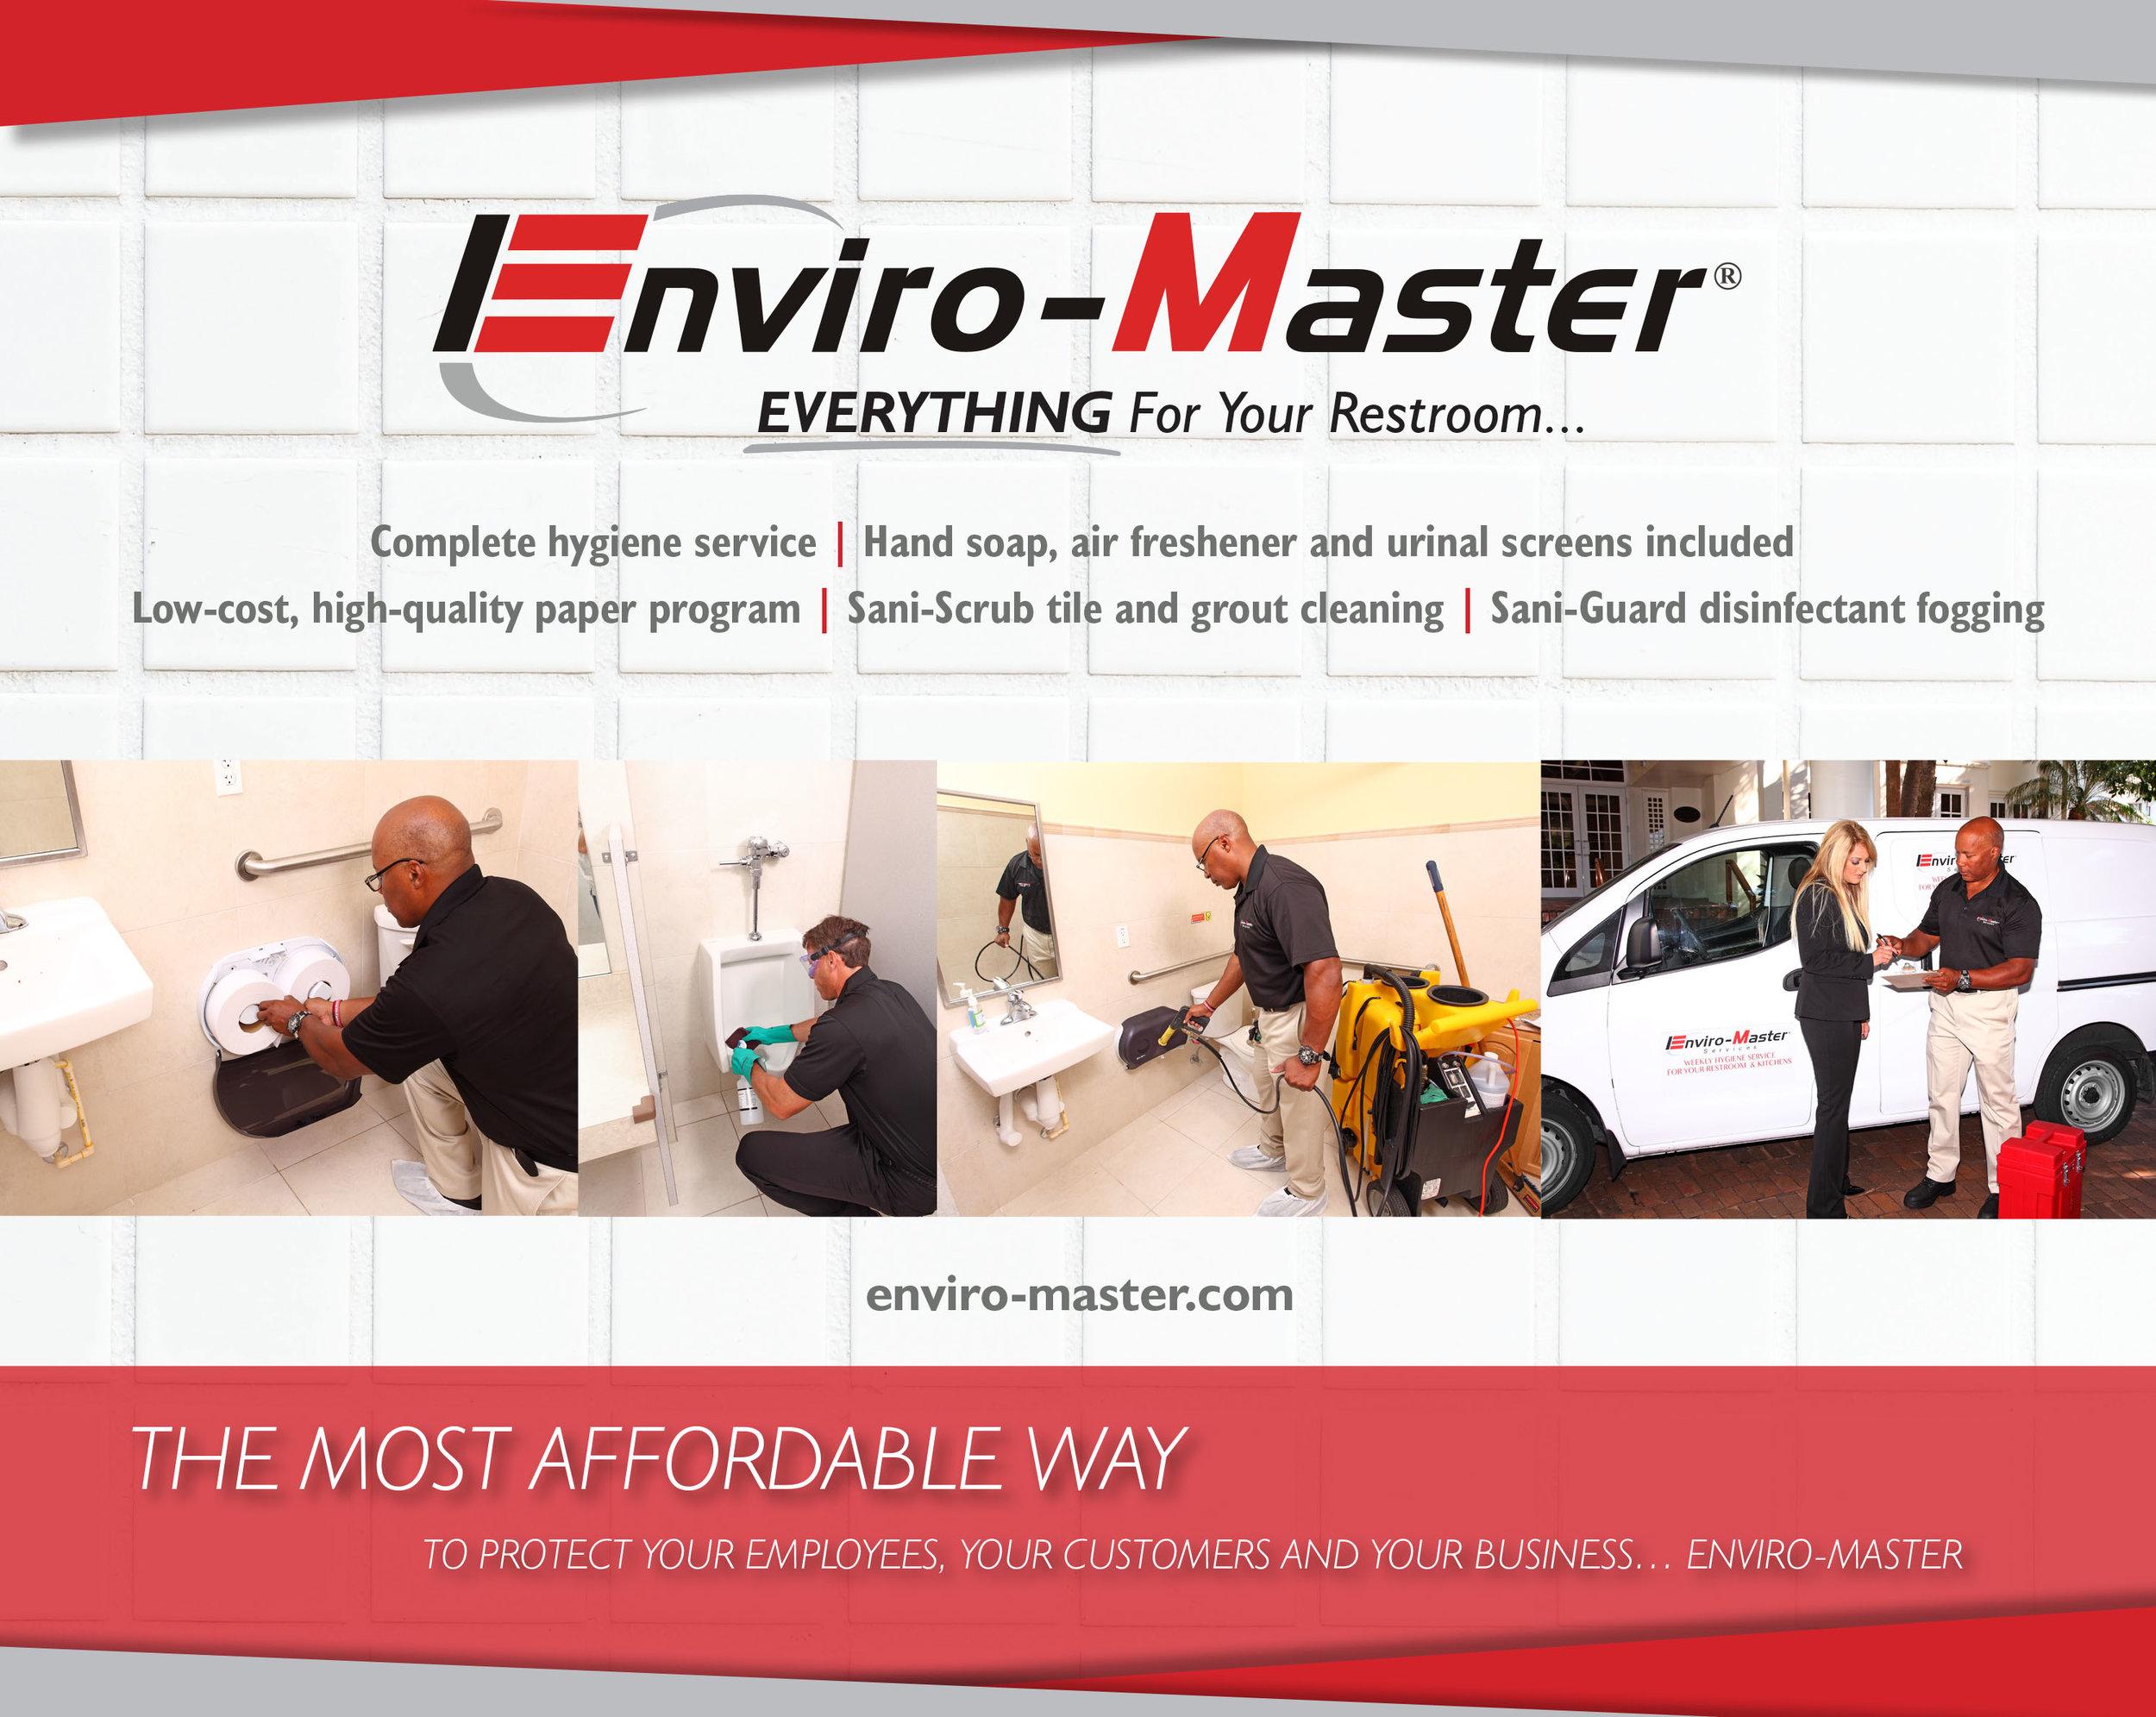 Client: Enviro-Master